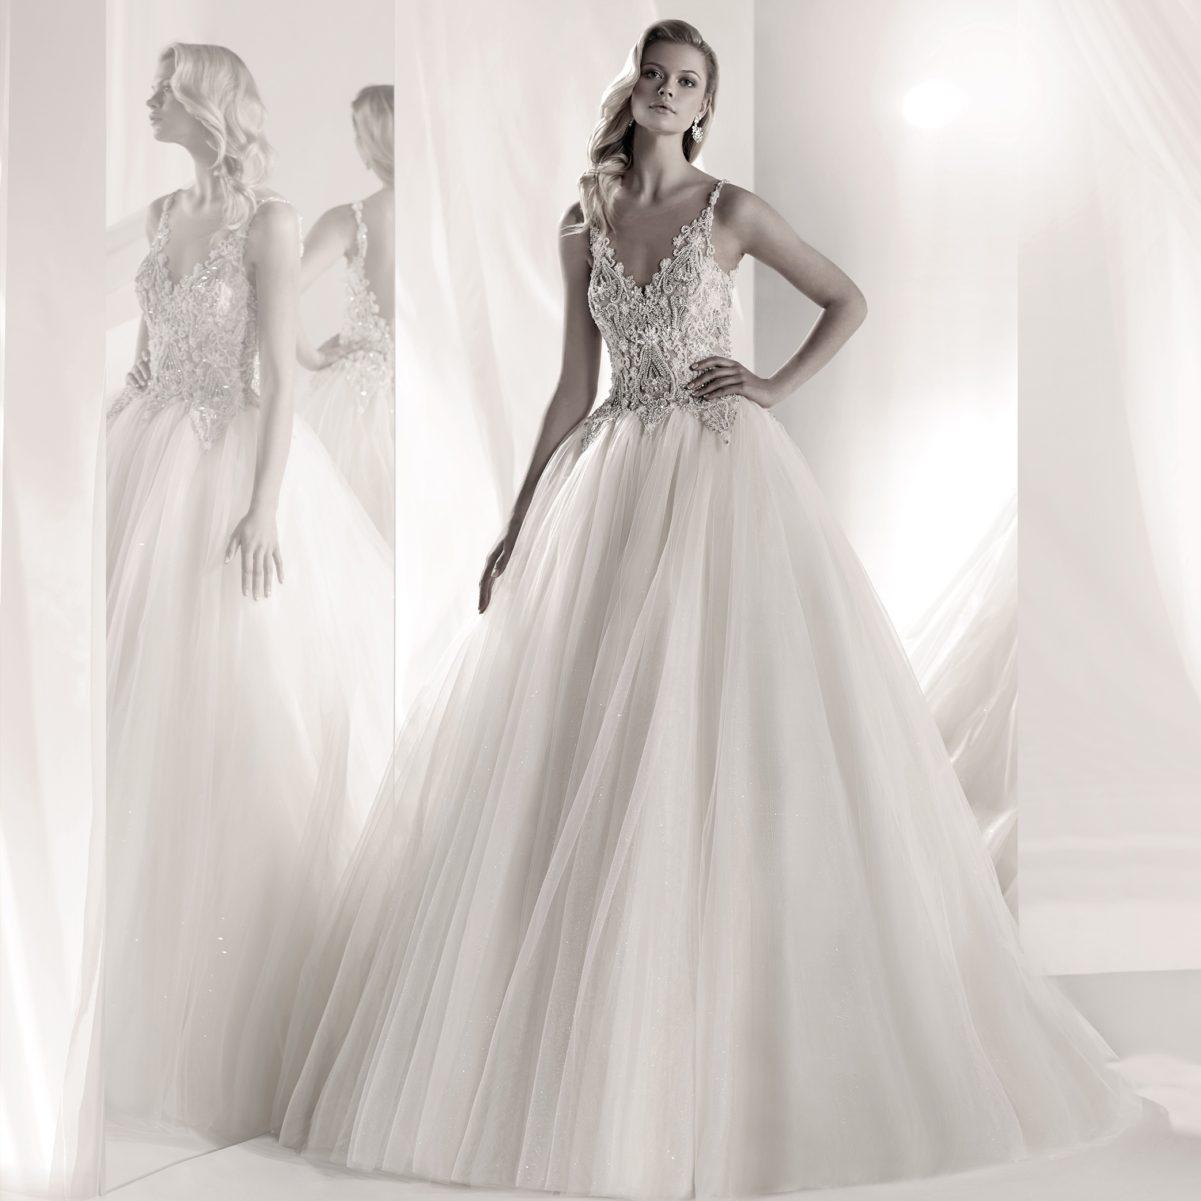 Nicole-Luxury-0003-01